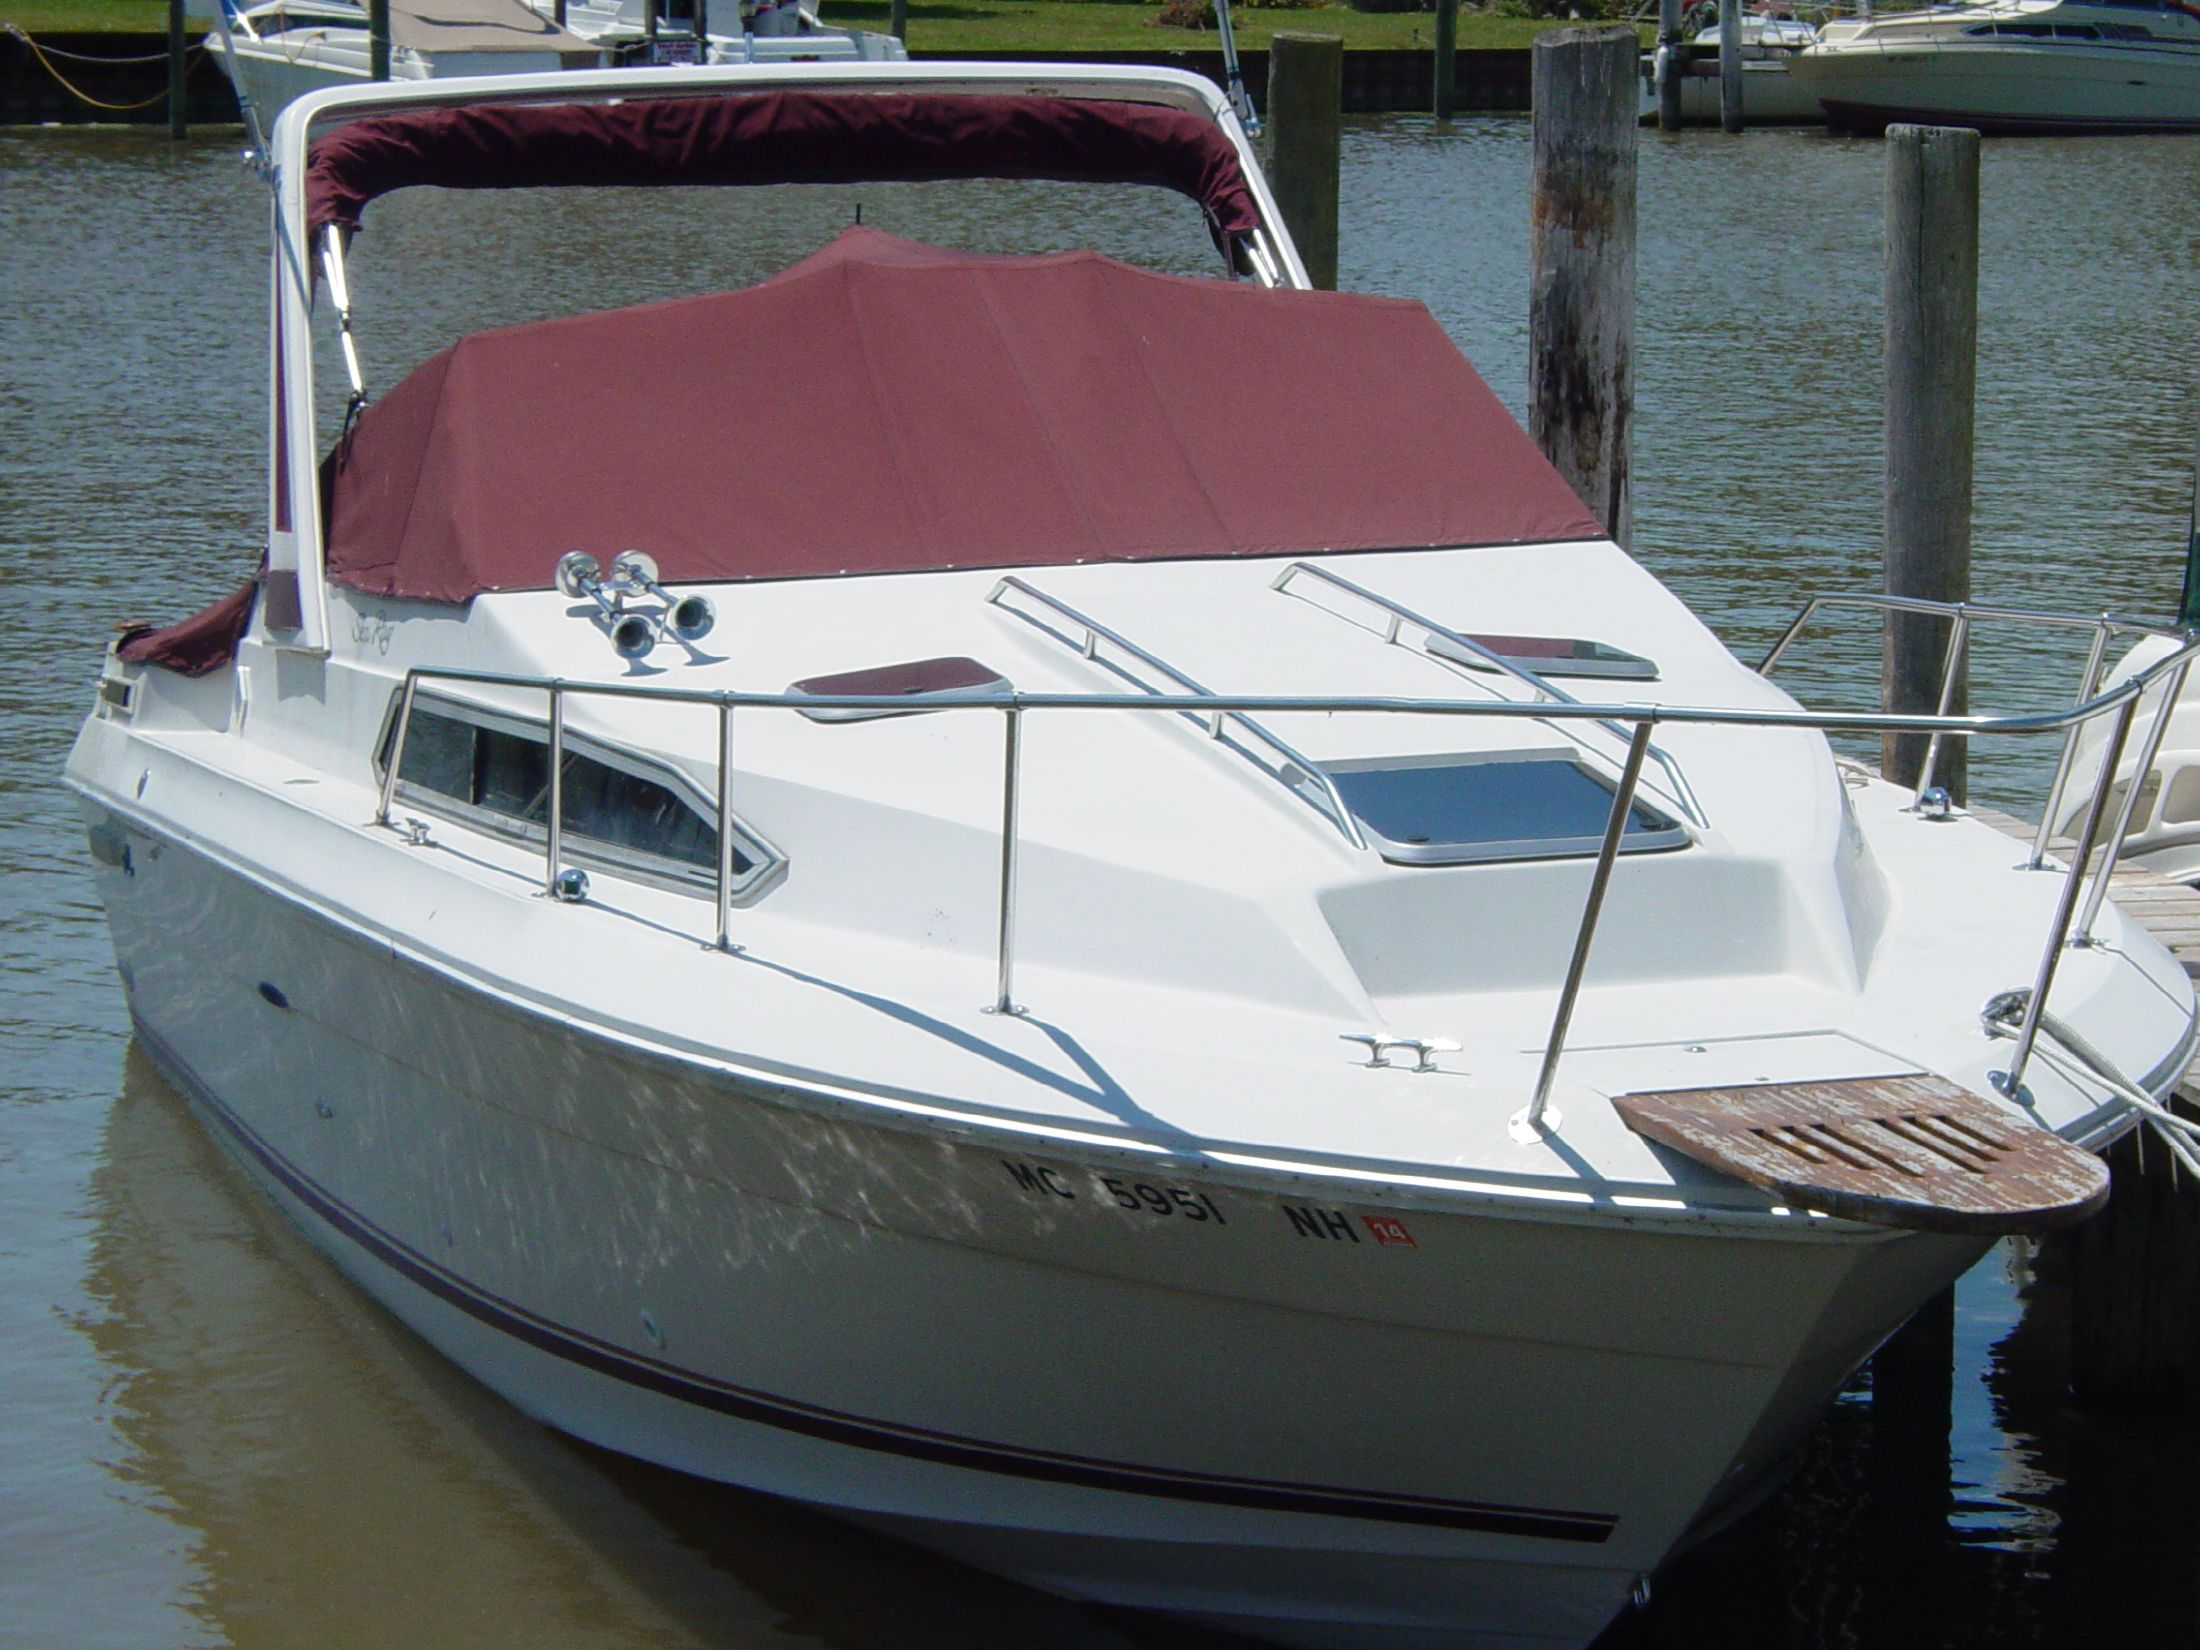 1987 Sea Ray 270 Sundancer Power Boat For Sale